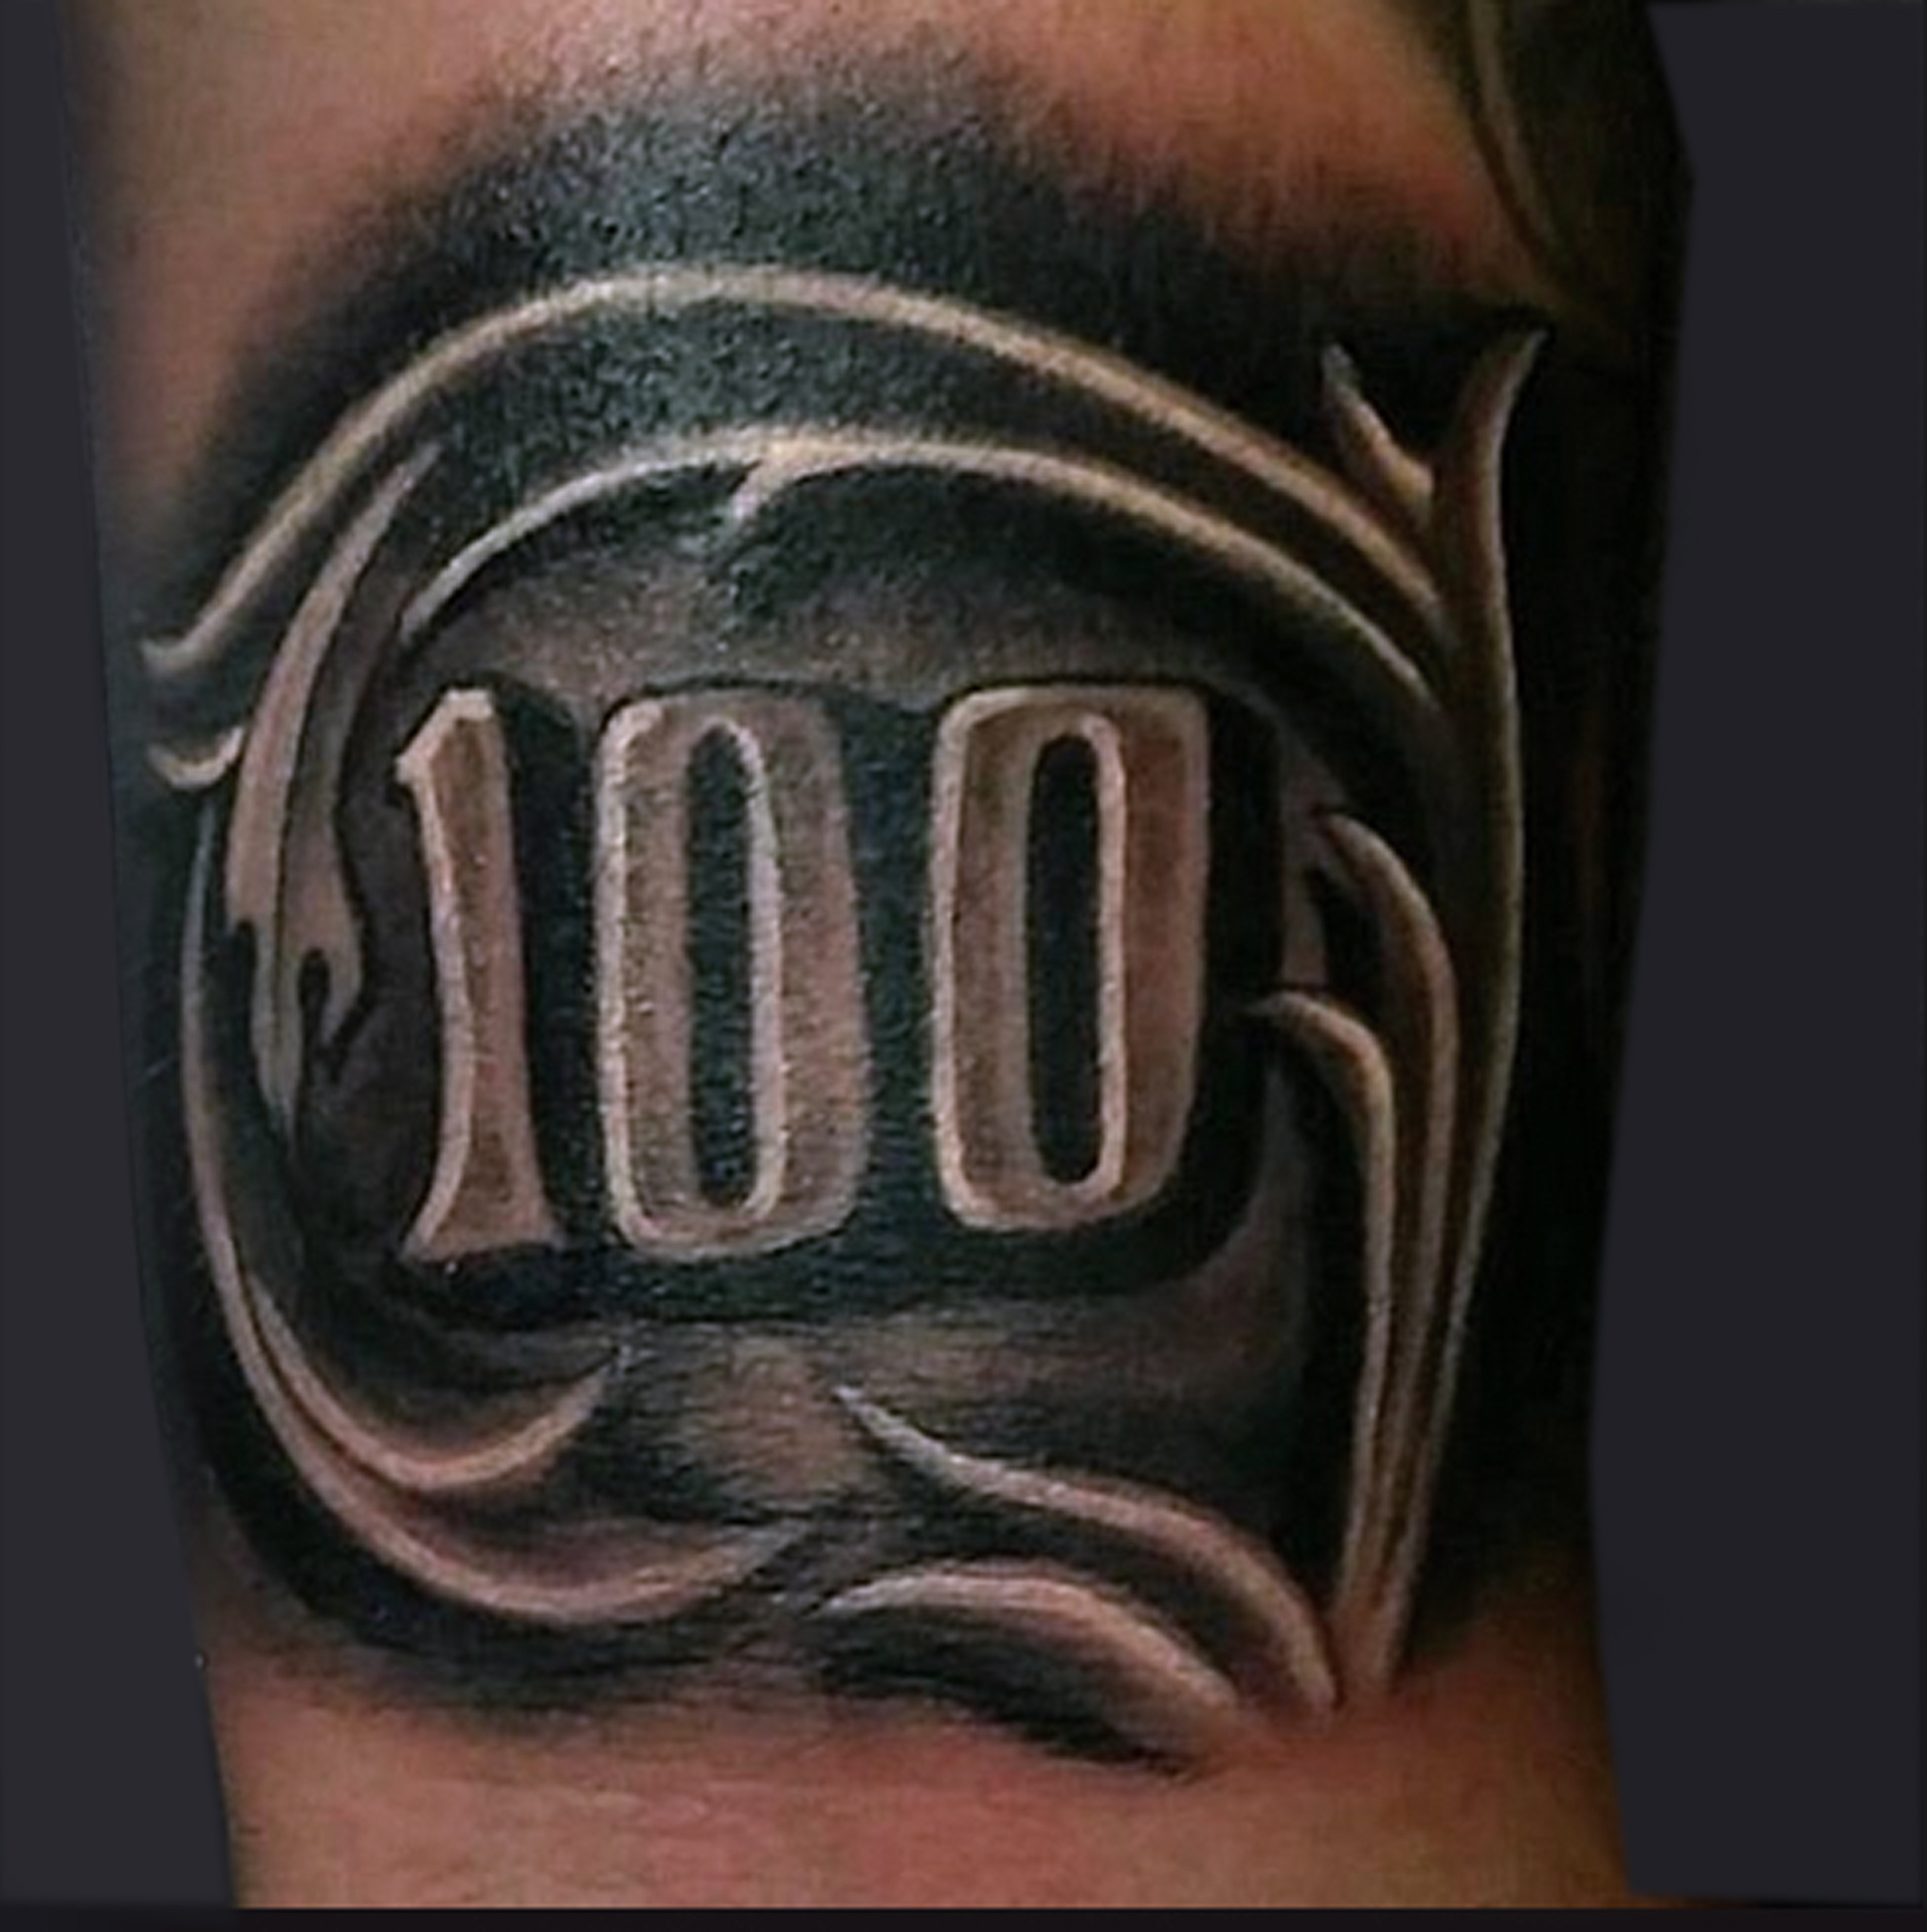 Tattoo Designs Under 100 Dollars: Black Ink Words In Ripped Skin Clover Leaf Tattoo Design